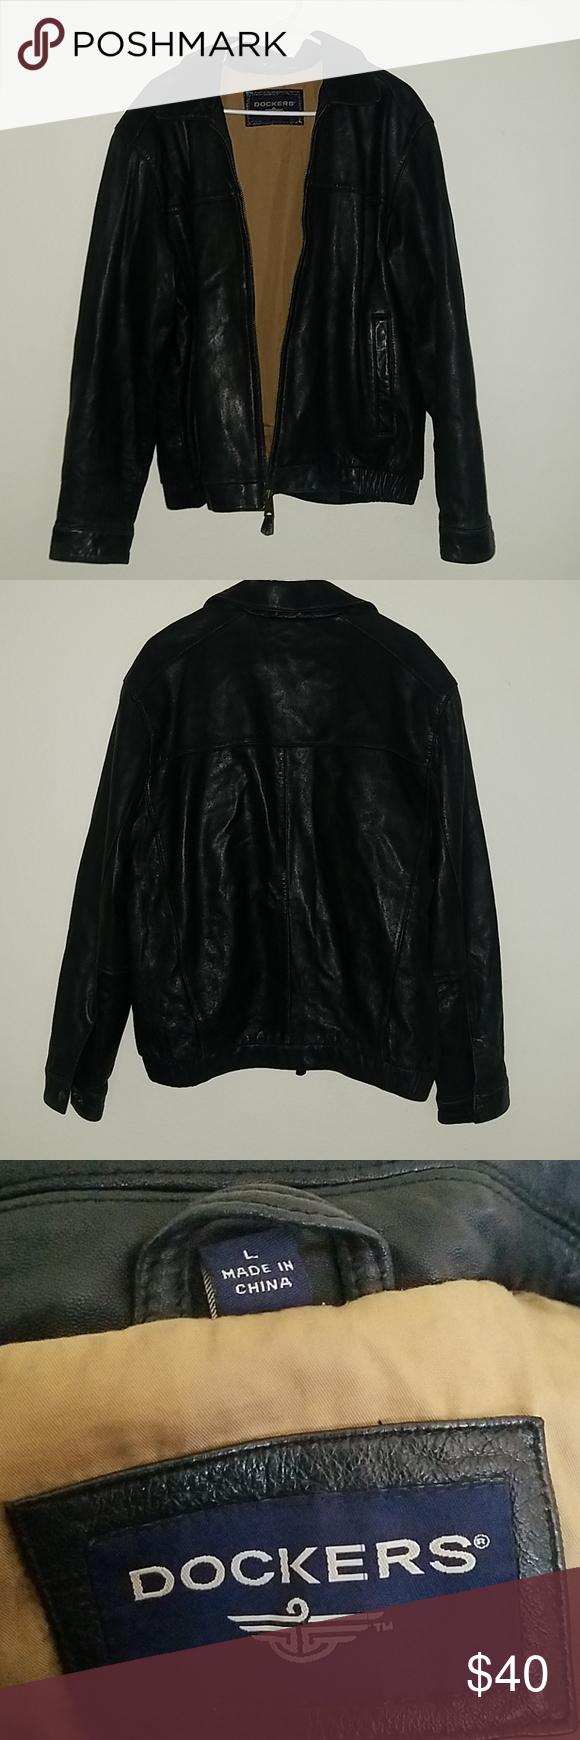 Dockers Mens Leather Jacket Leather jacket, Men's